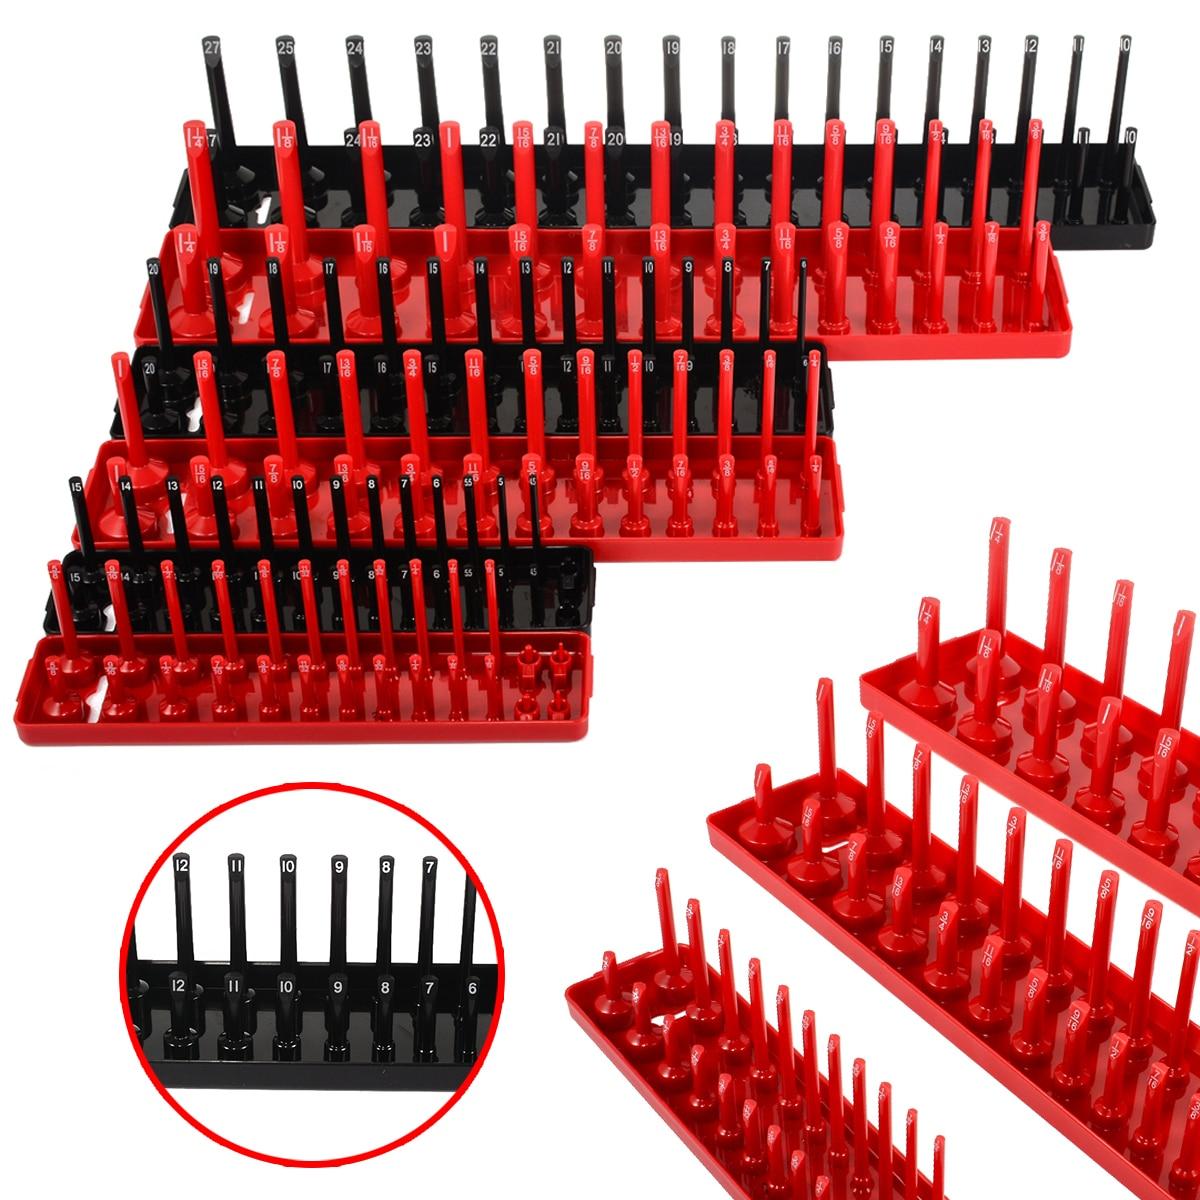 "6pcs 1/4"" 3/8"" 1/2"" Metric SAE Socket Tray Rack Holder Garage Tool Organizer Plastic Rack Holder Storage Tool Organizer"